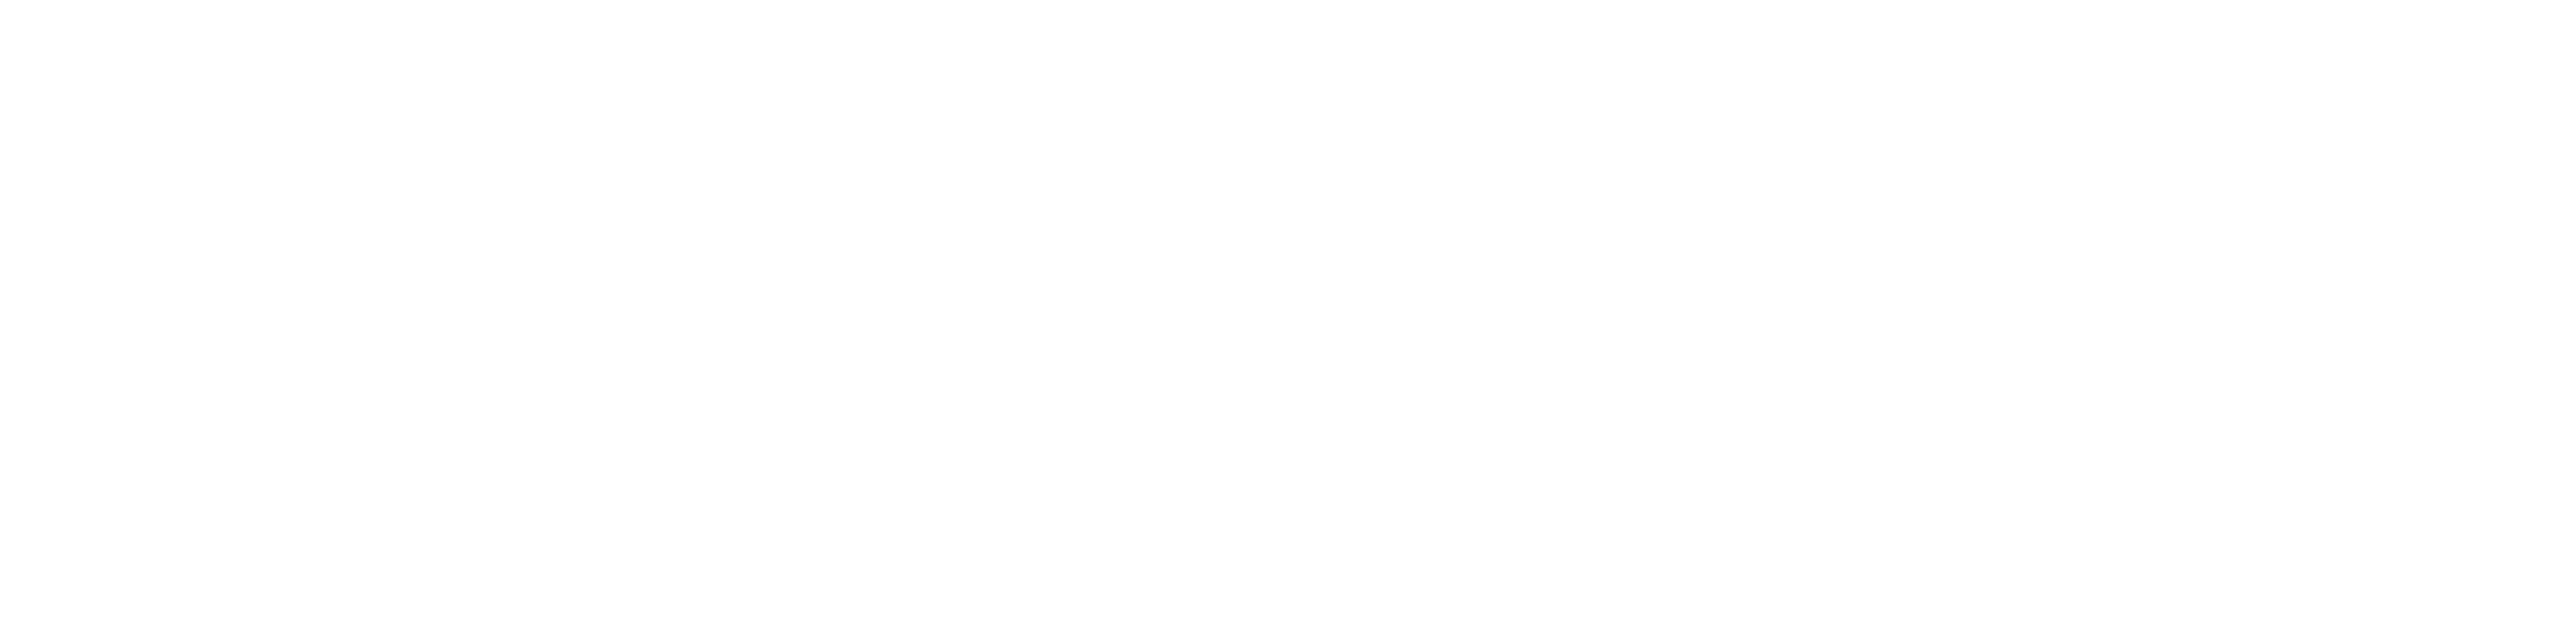 MWCC logo white